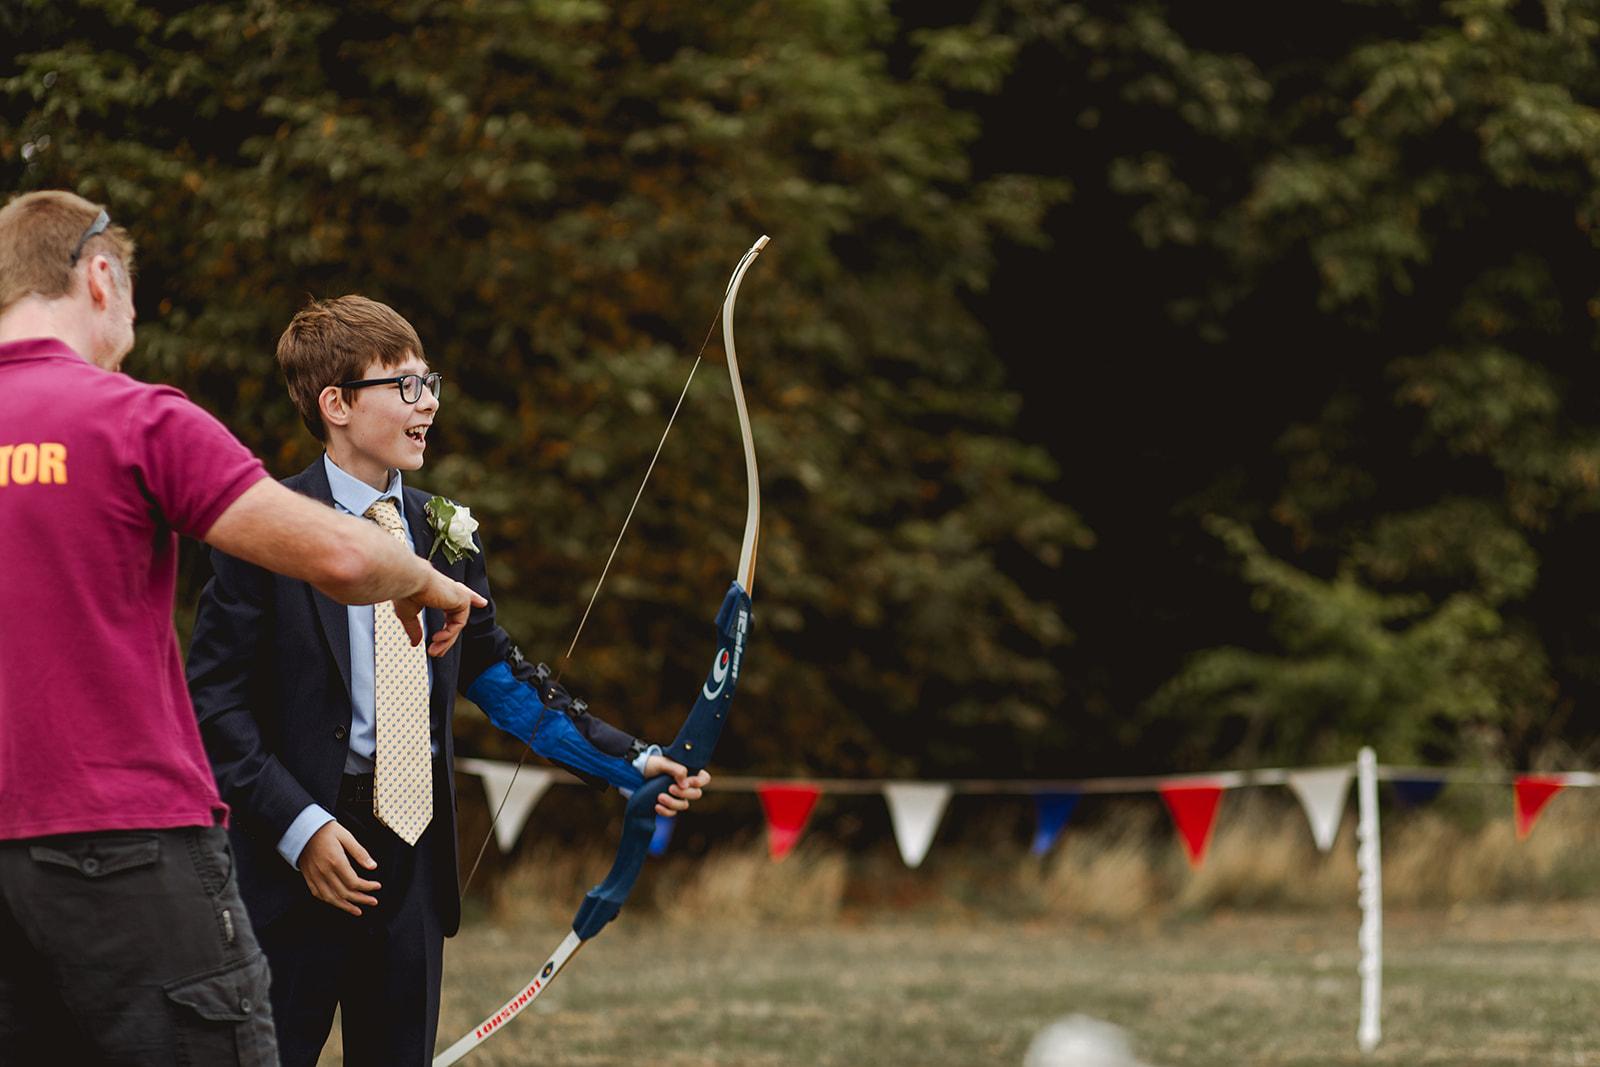 Eggington House marquee wedding_archery activity